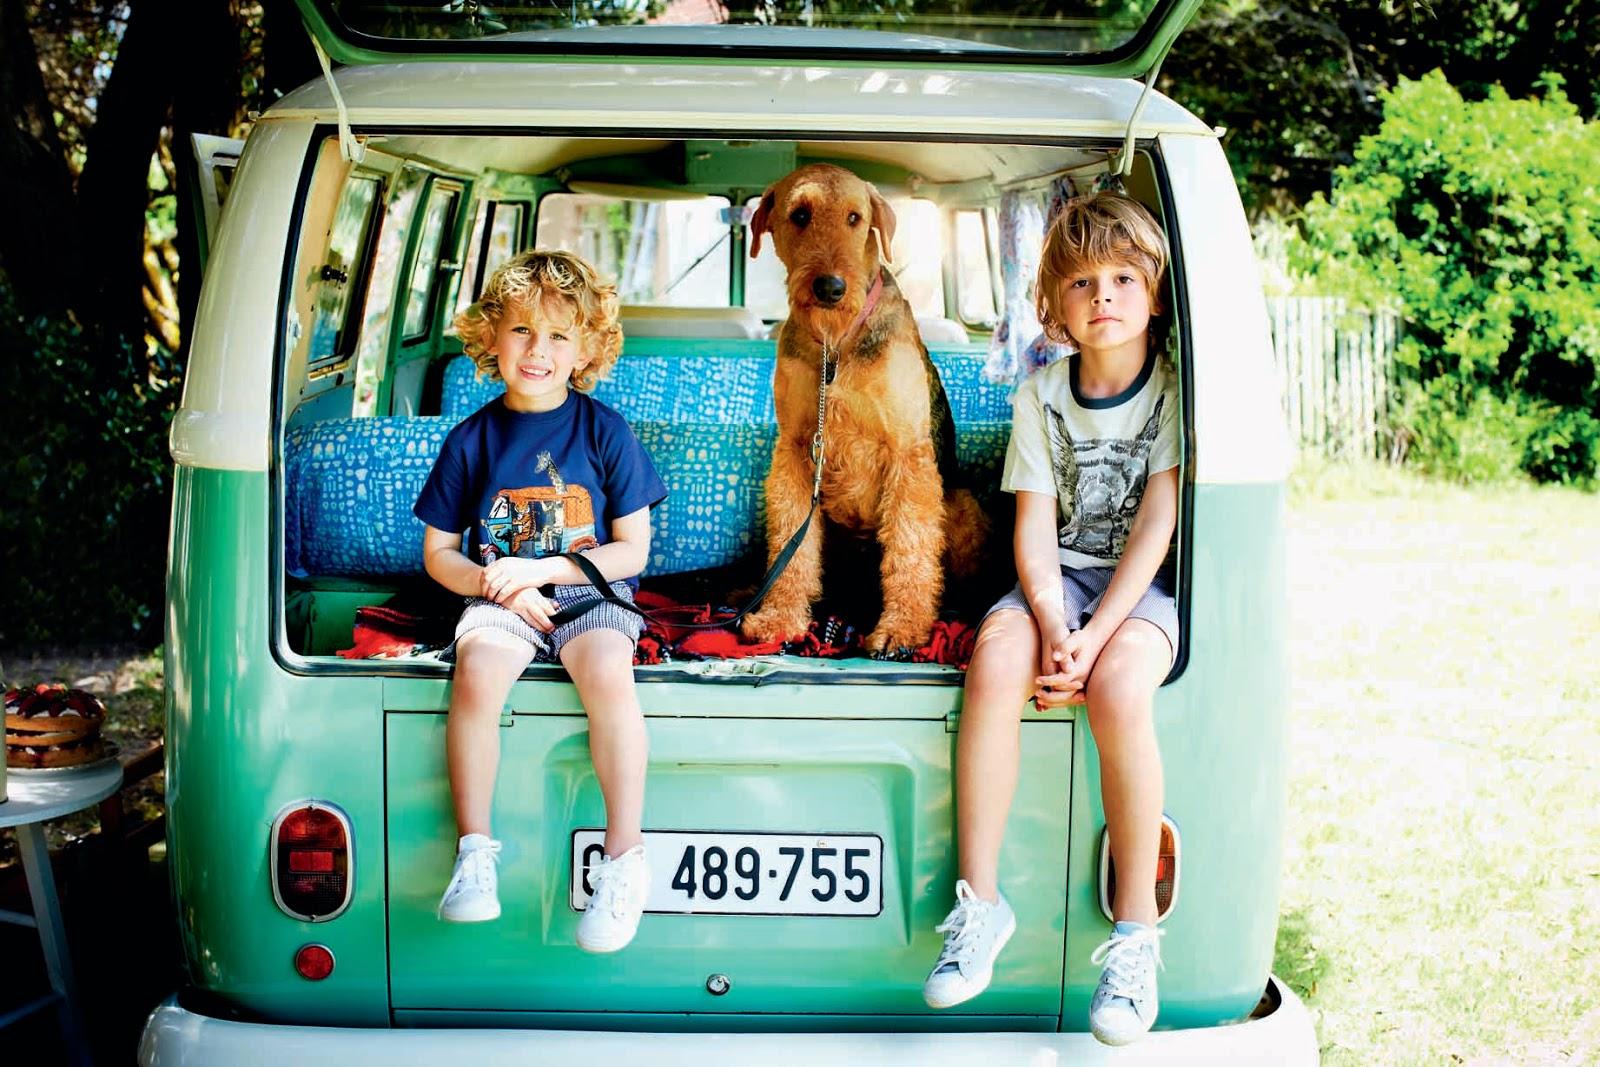 c9c8dde340 ... και οι μικροί φίλοι ετοιμάζονται να κάνουν την πιο πολύχρωμη δήλωση  μόδας για τη σεζόν Άνοιξη Καλοκαίρι 2014 με τη νέα παιδική συλλογή Monsoon  Children.